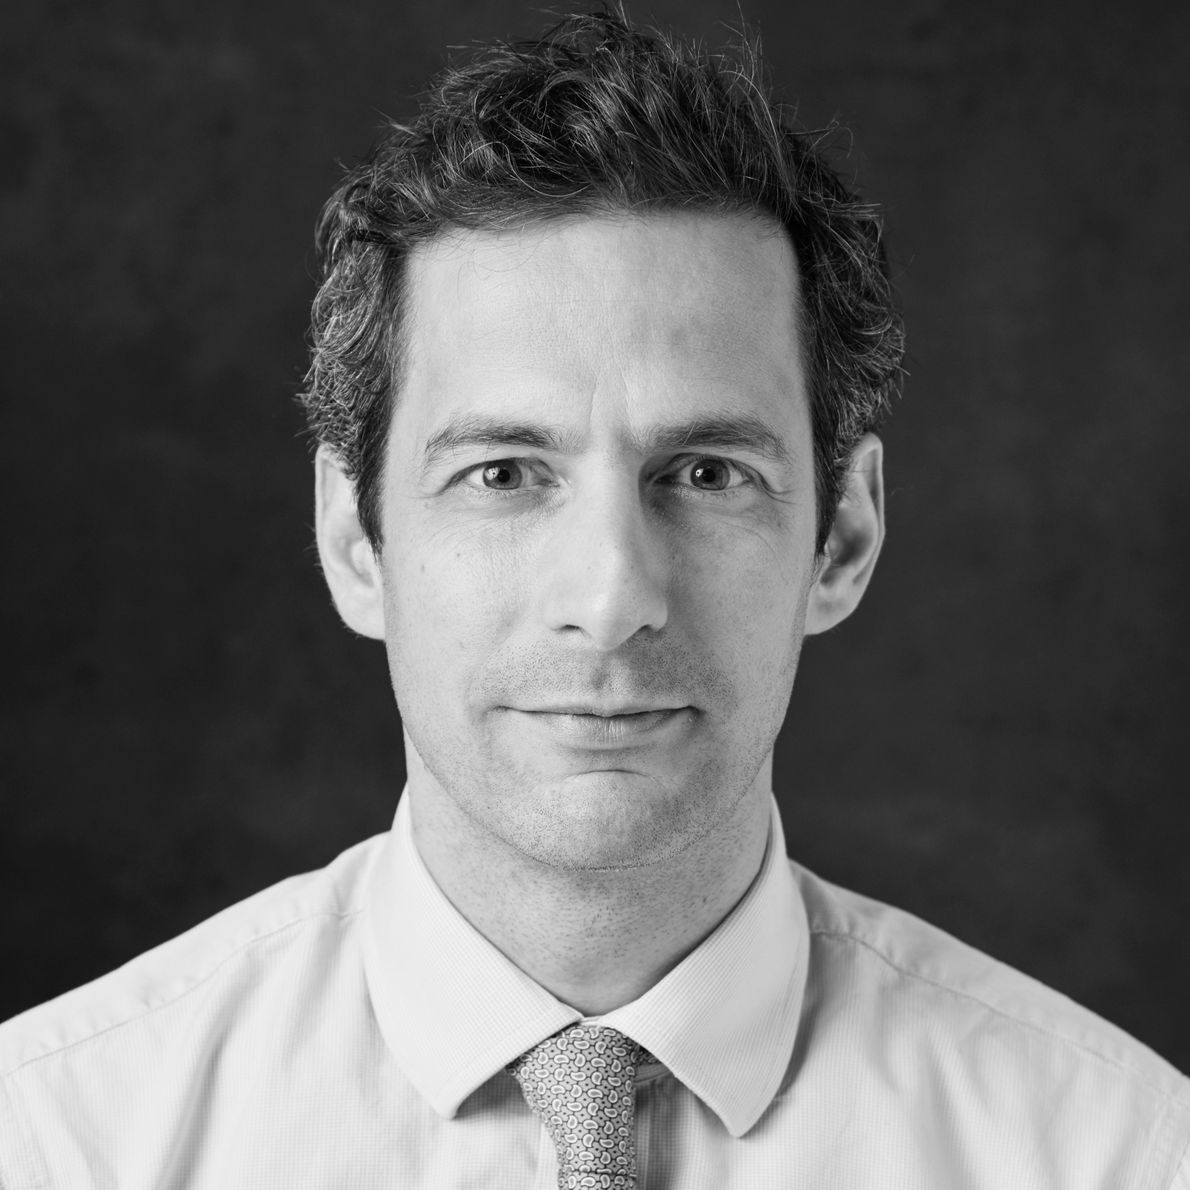 Jamie Butterworth, a Voz da Economia Circular